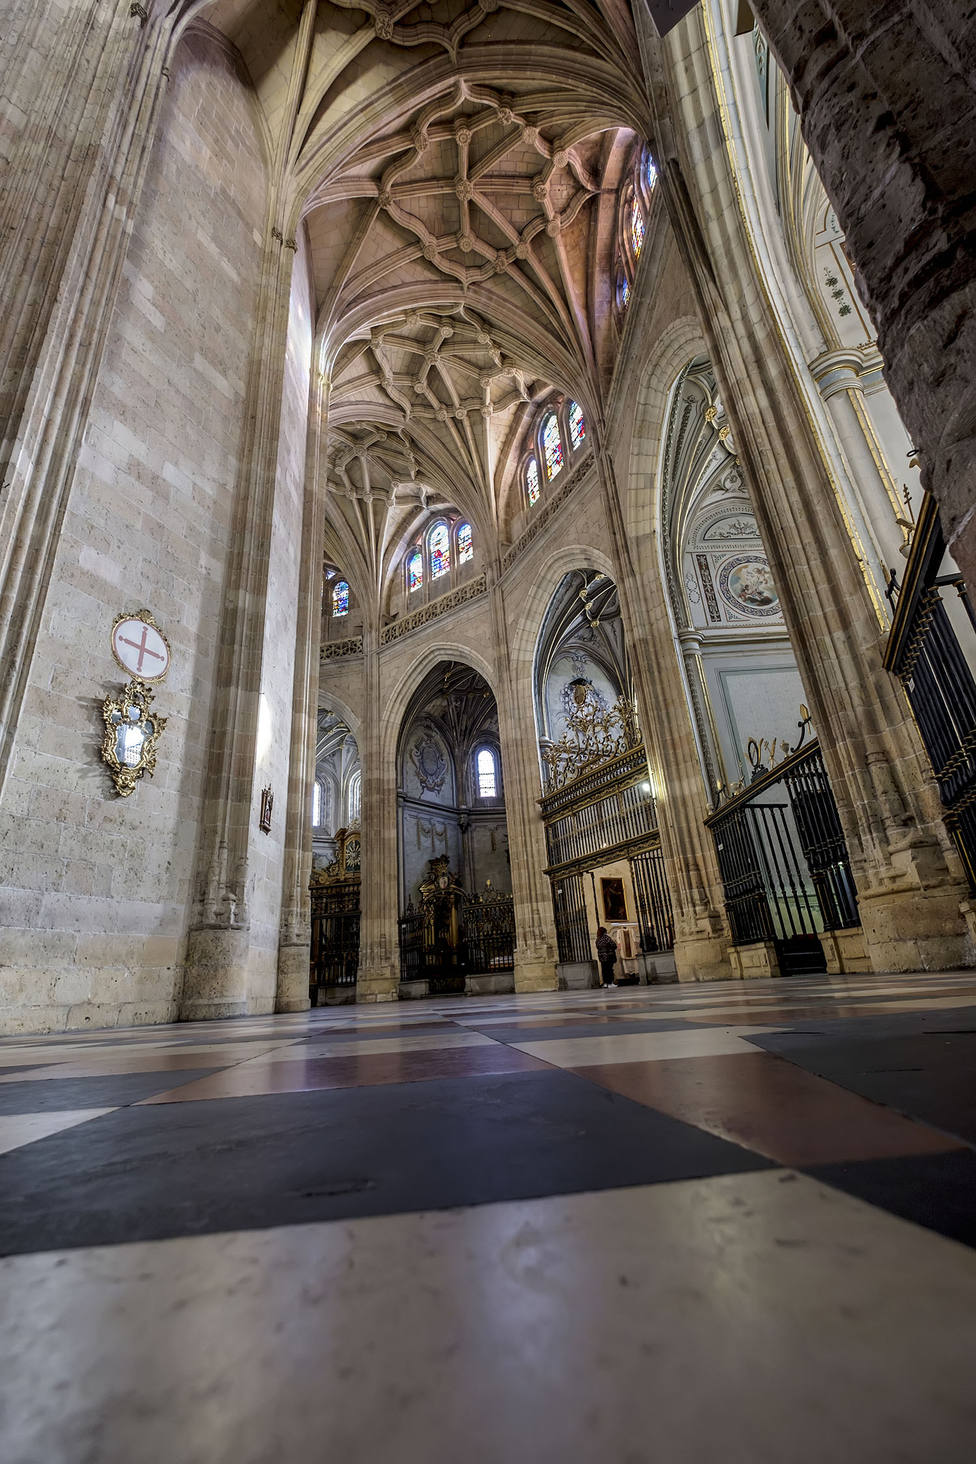 ctv-0qz-20171206 catedral-girola kam9514